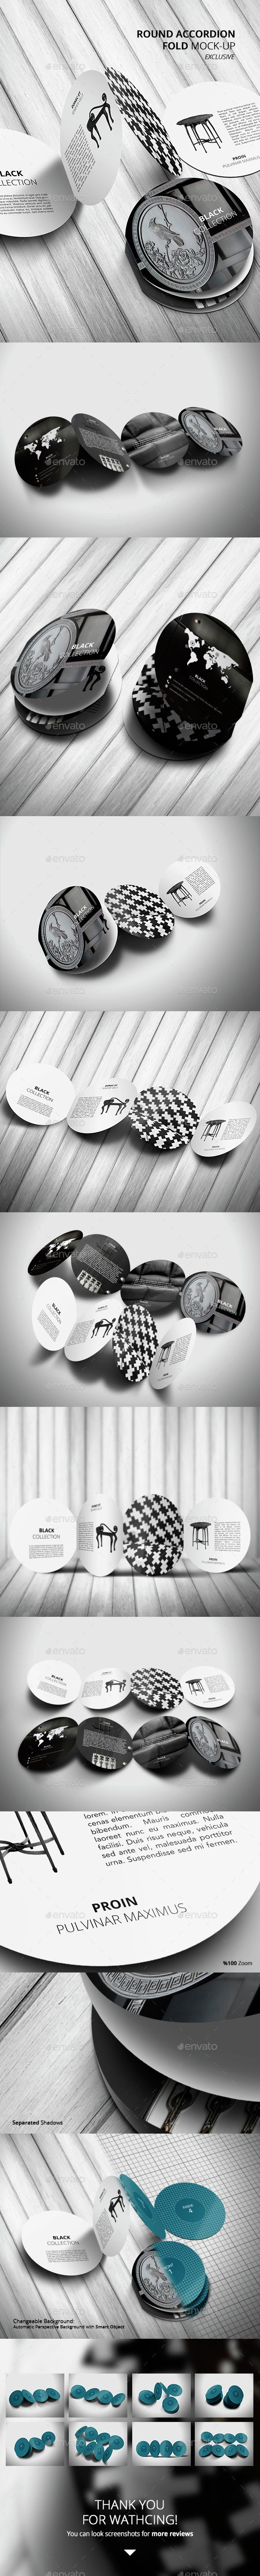 Round Accordion Fold Brochure Mock-Up - Product Mock-Ups Graphics